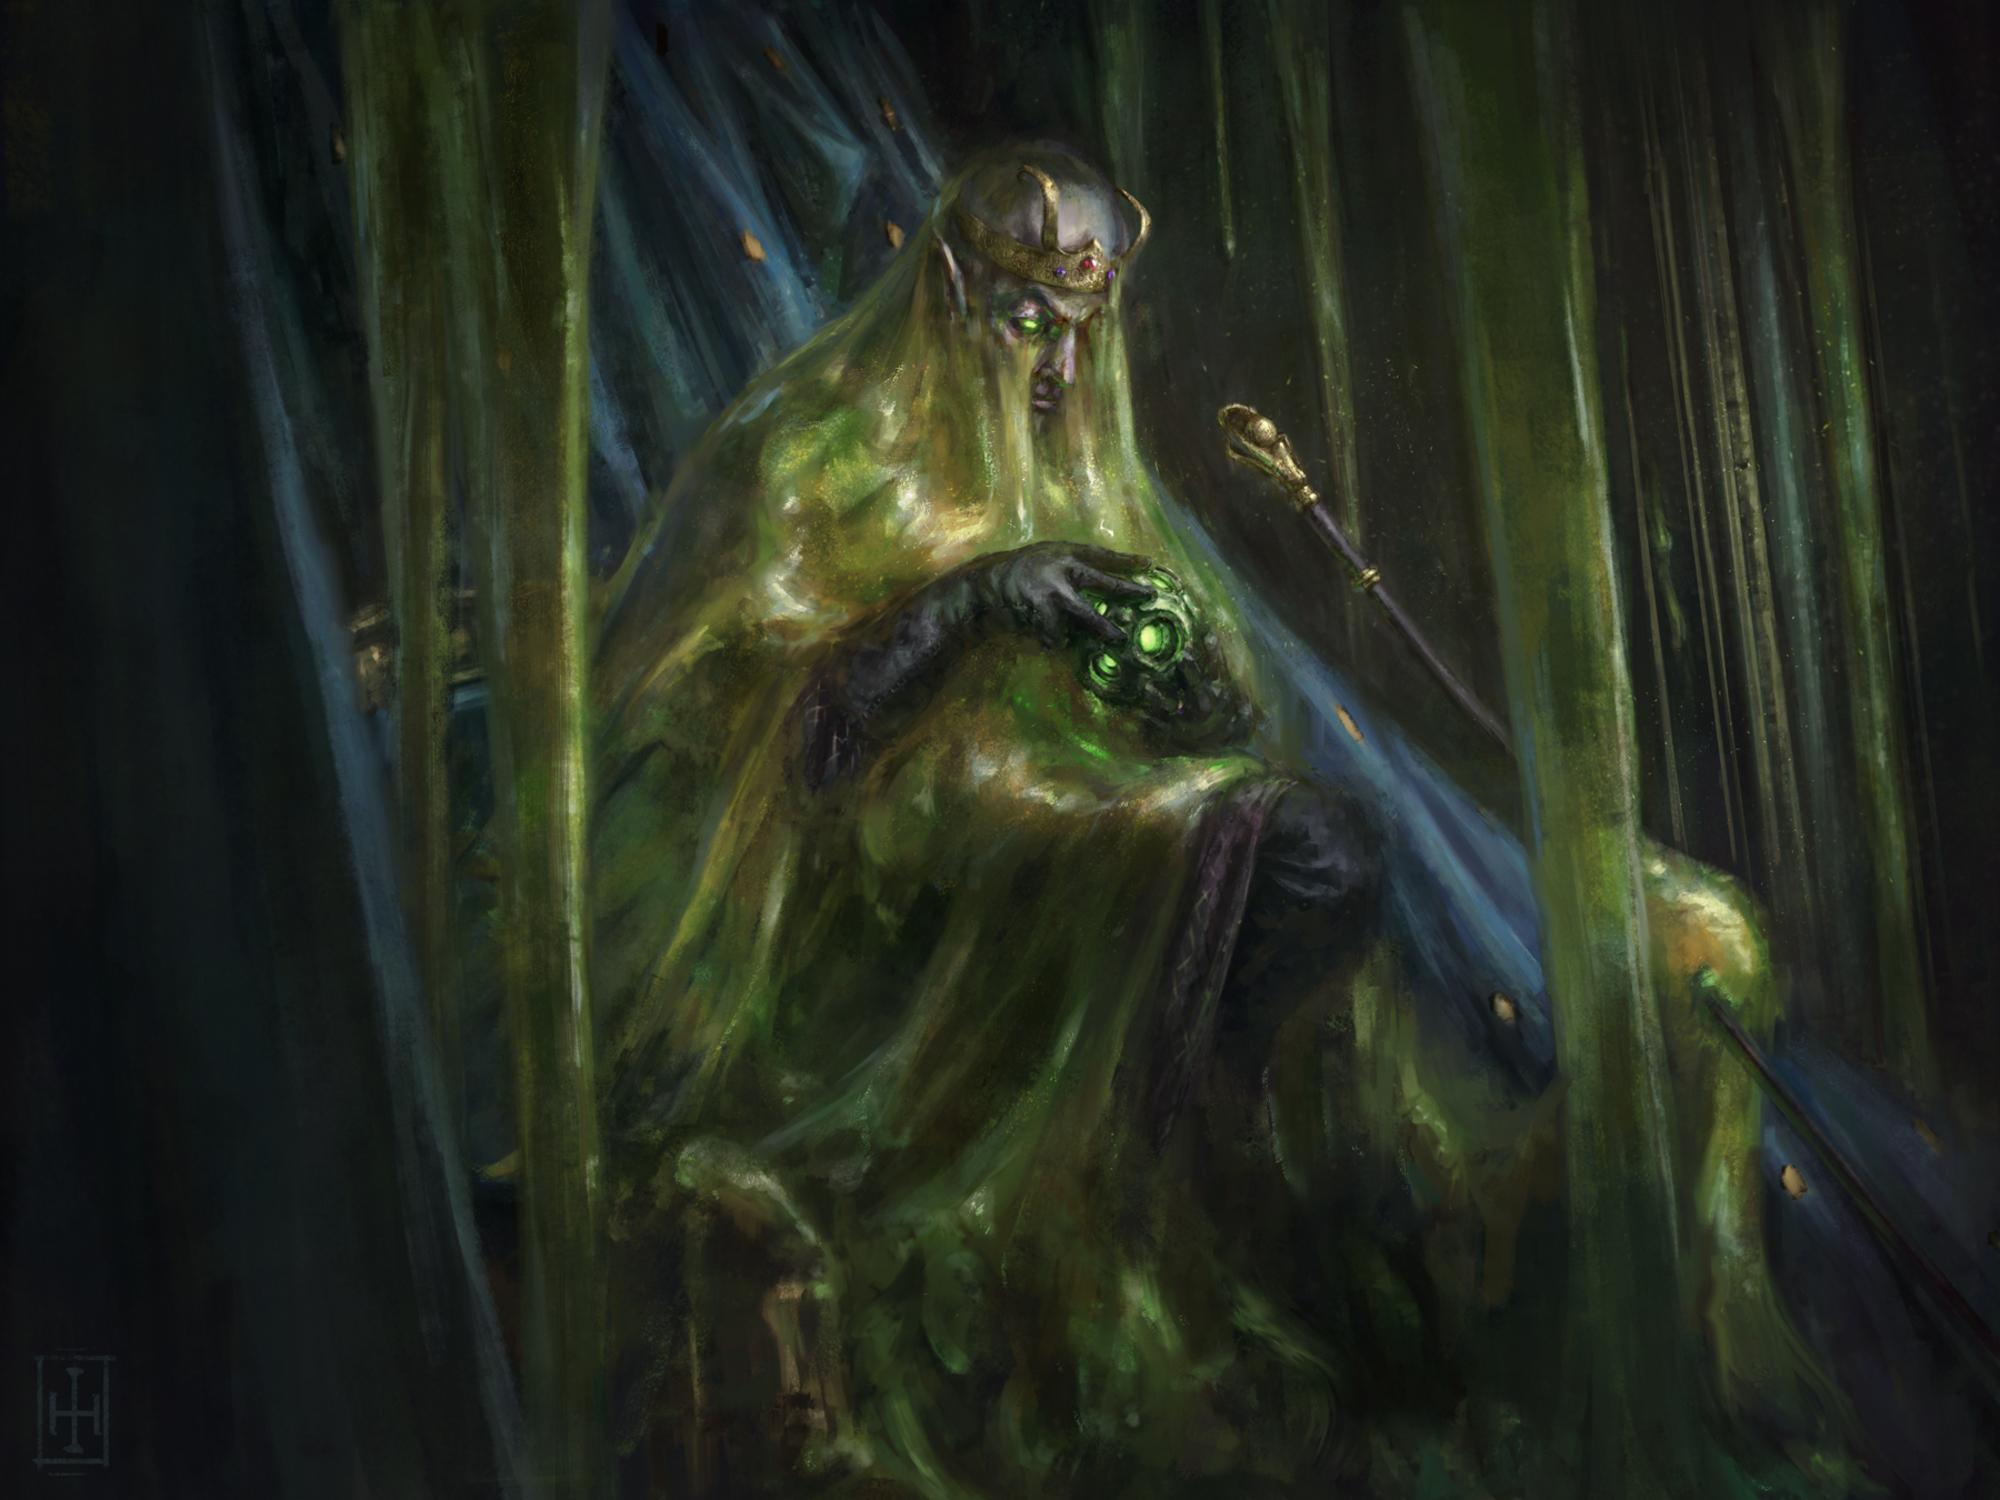 Slime King Artwork by Ian Hinley